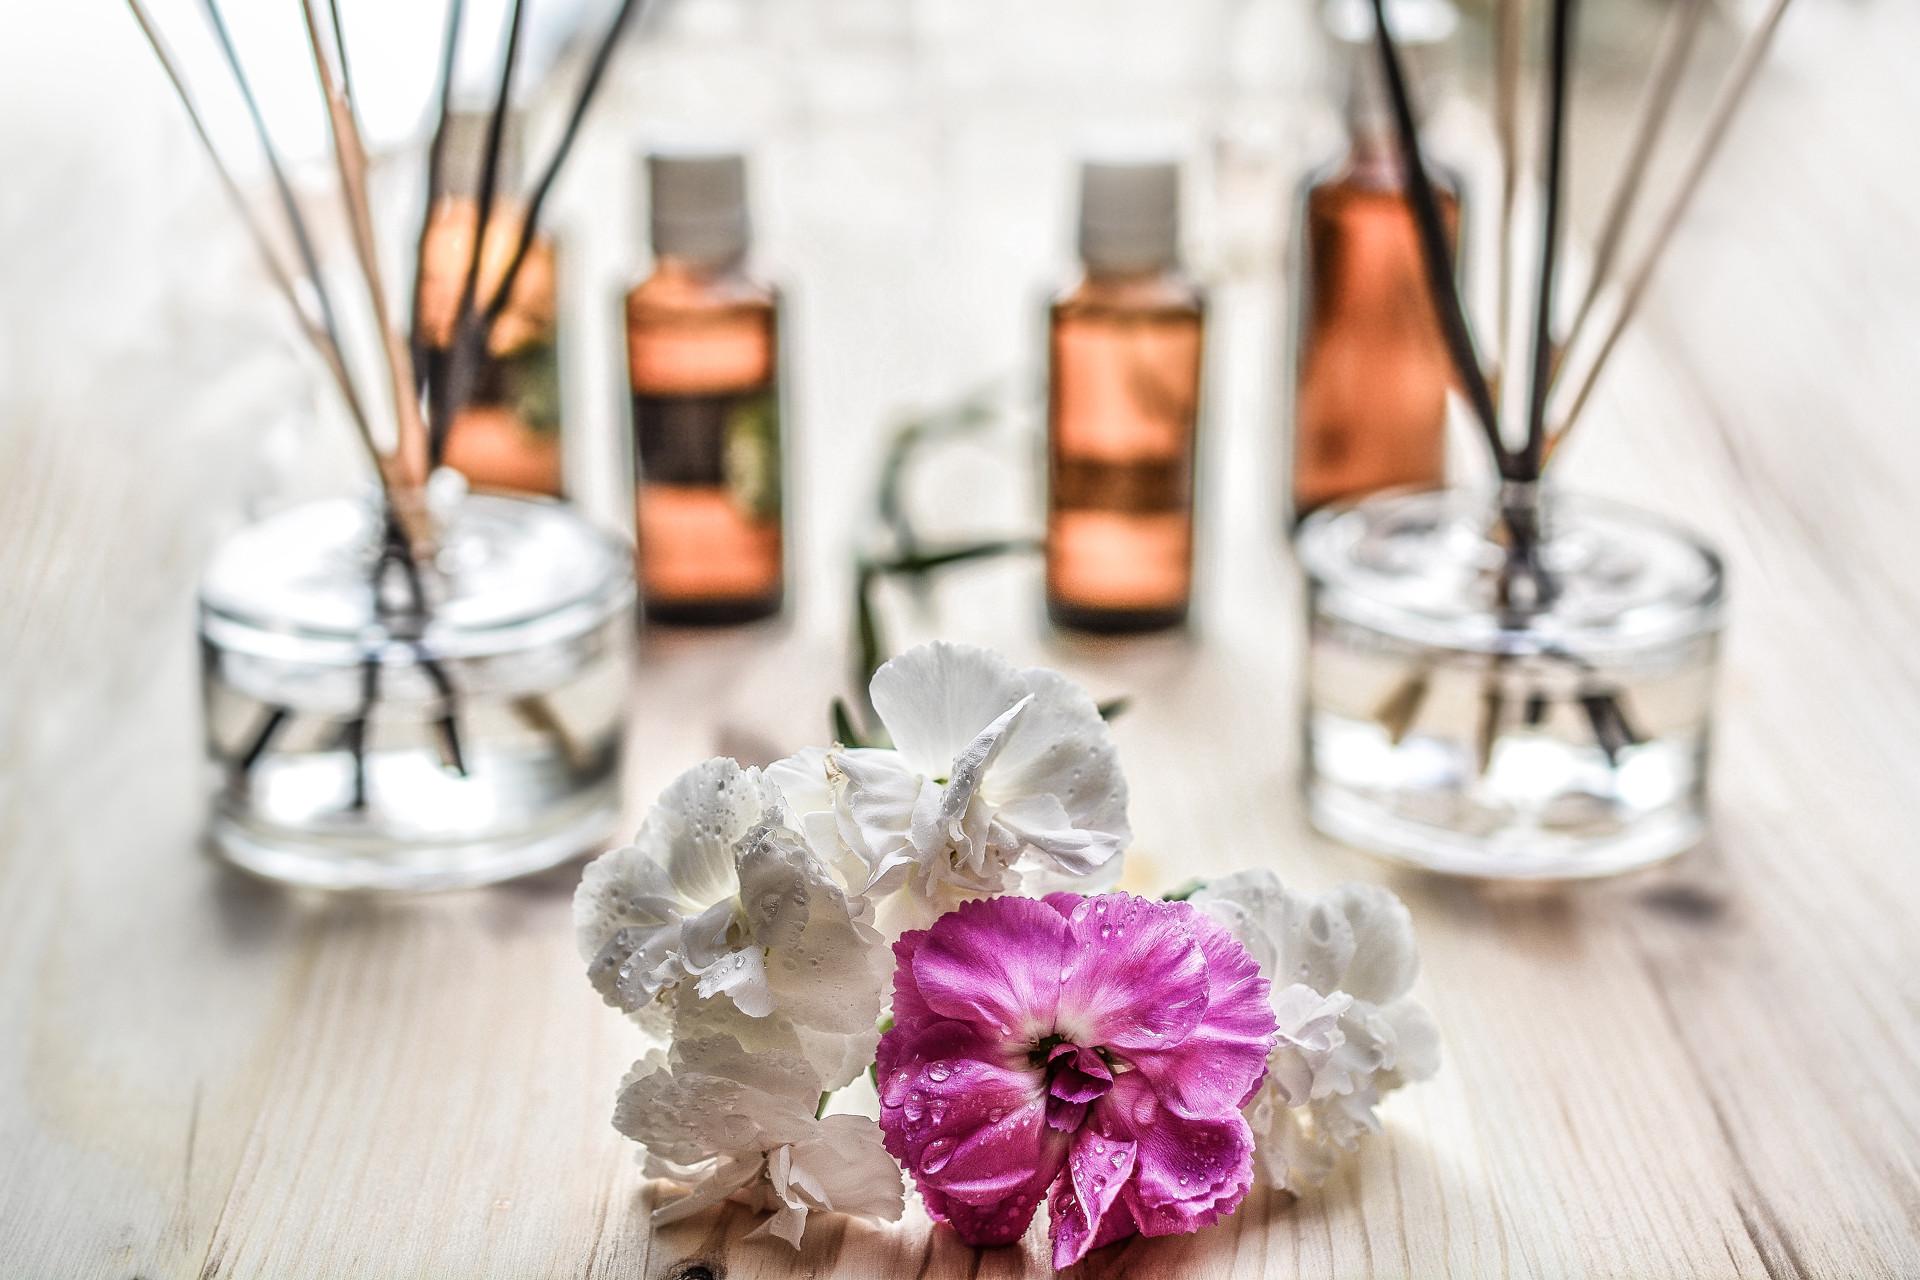 My kind of Zen - Best seller essential oils starter kit